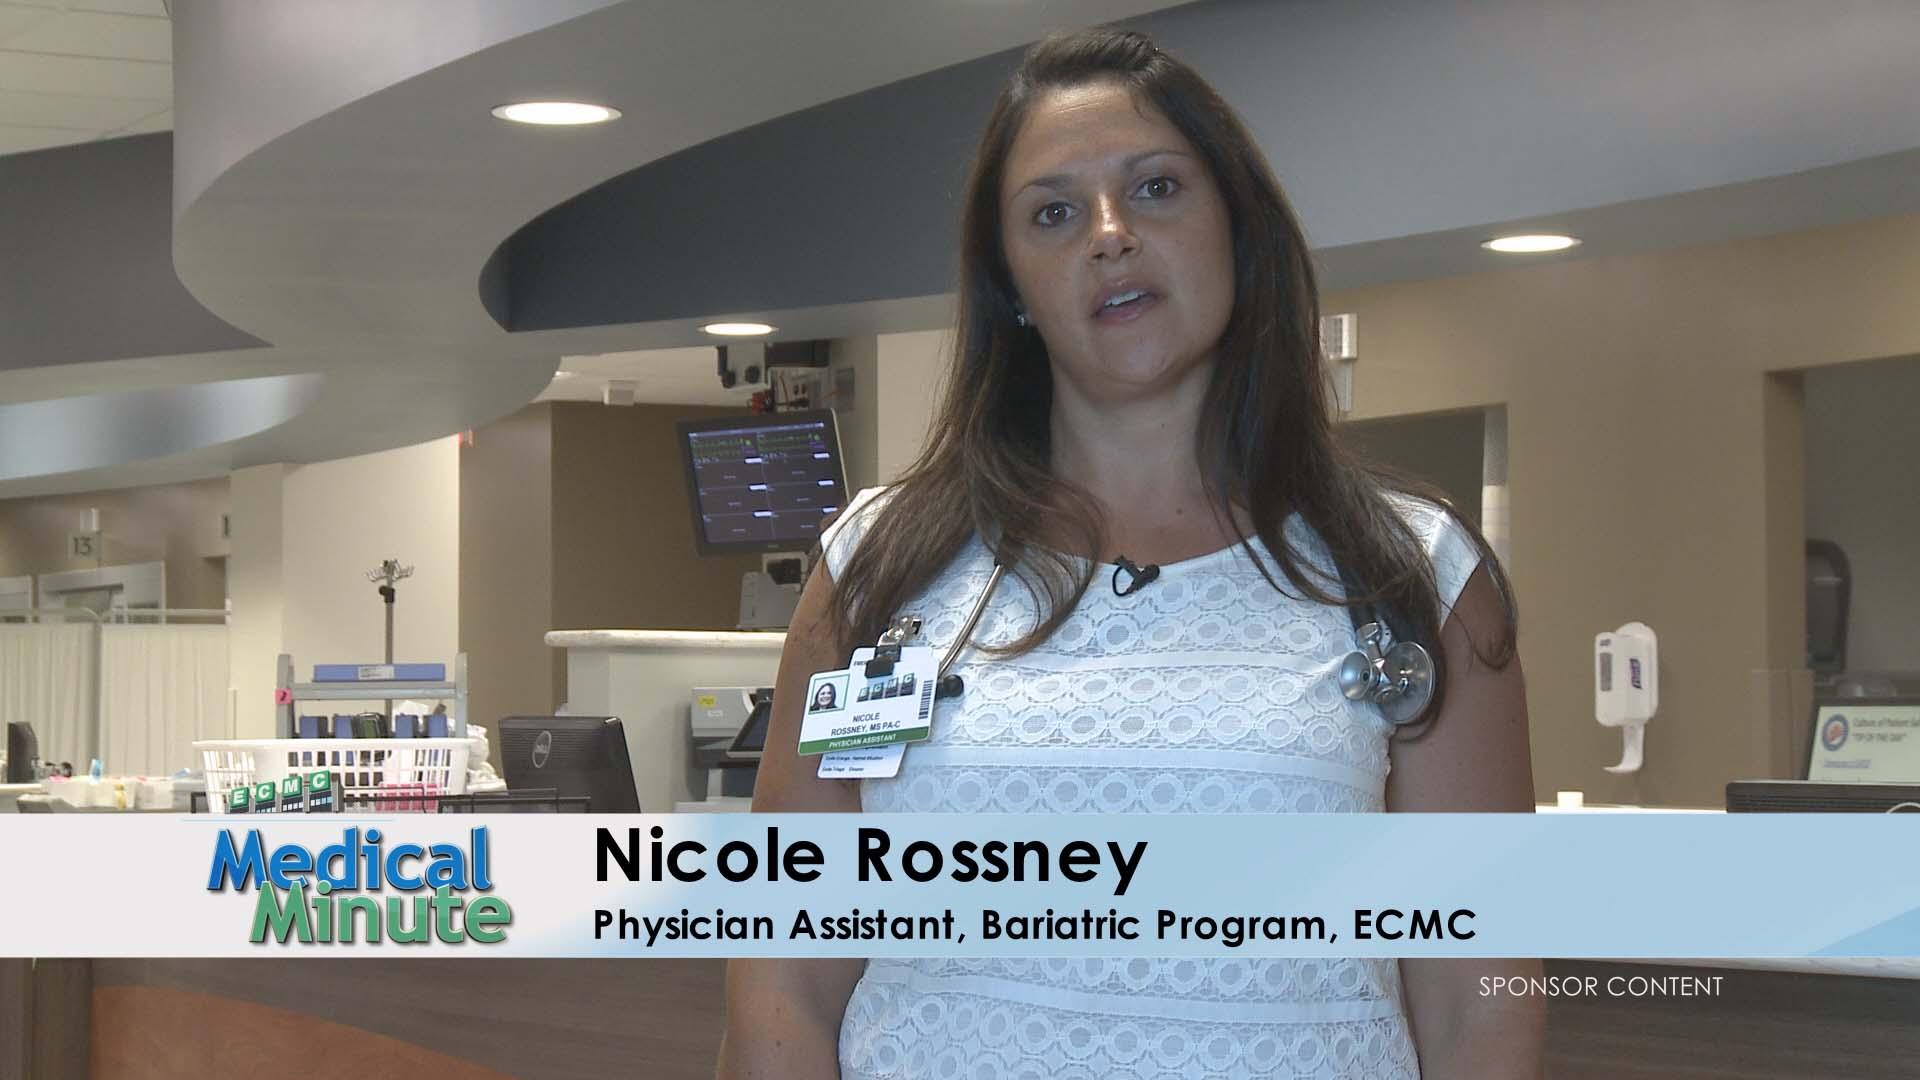 ECMC MEDICAL MINUTE NICOLE ROSSNEY OBESITY 07.17.17 STILL